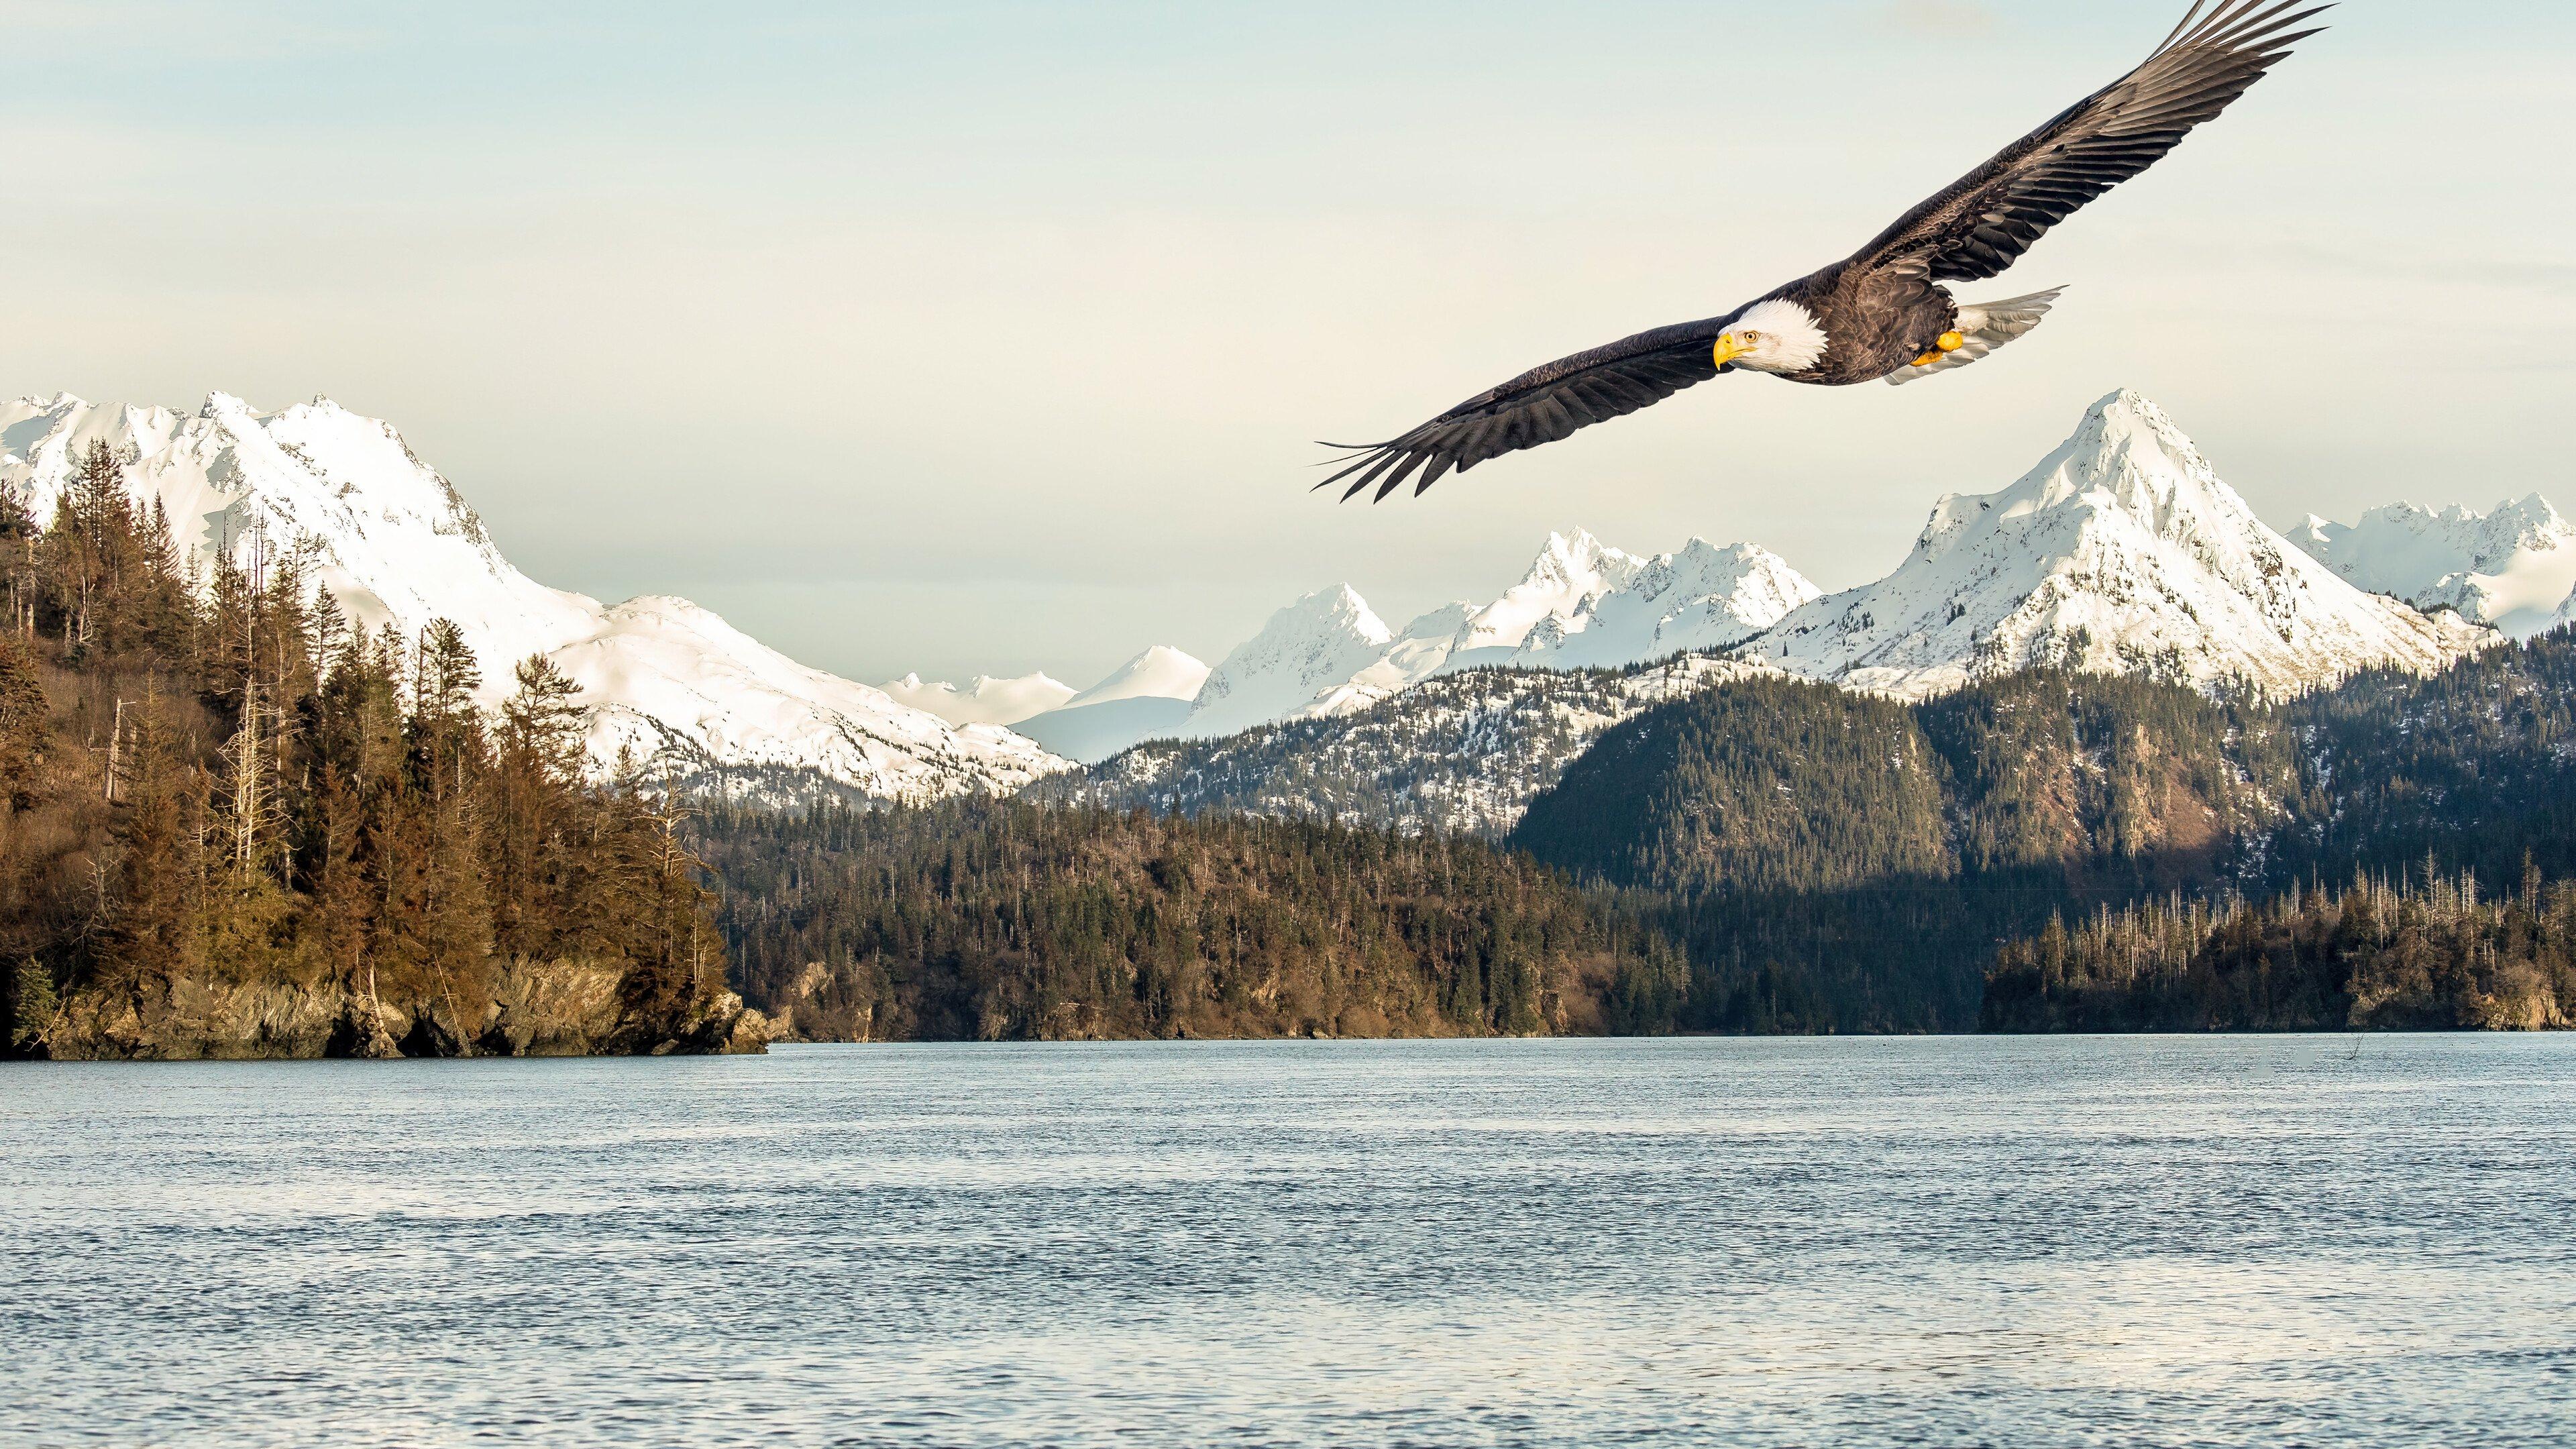 Wallpaper Eagle flying over lake